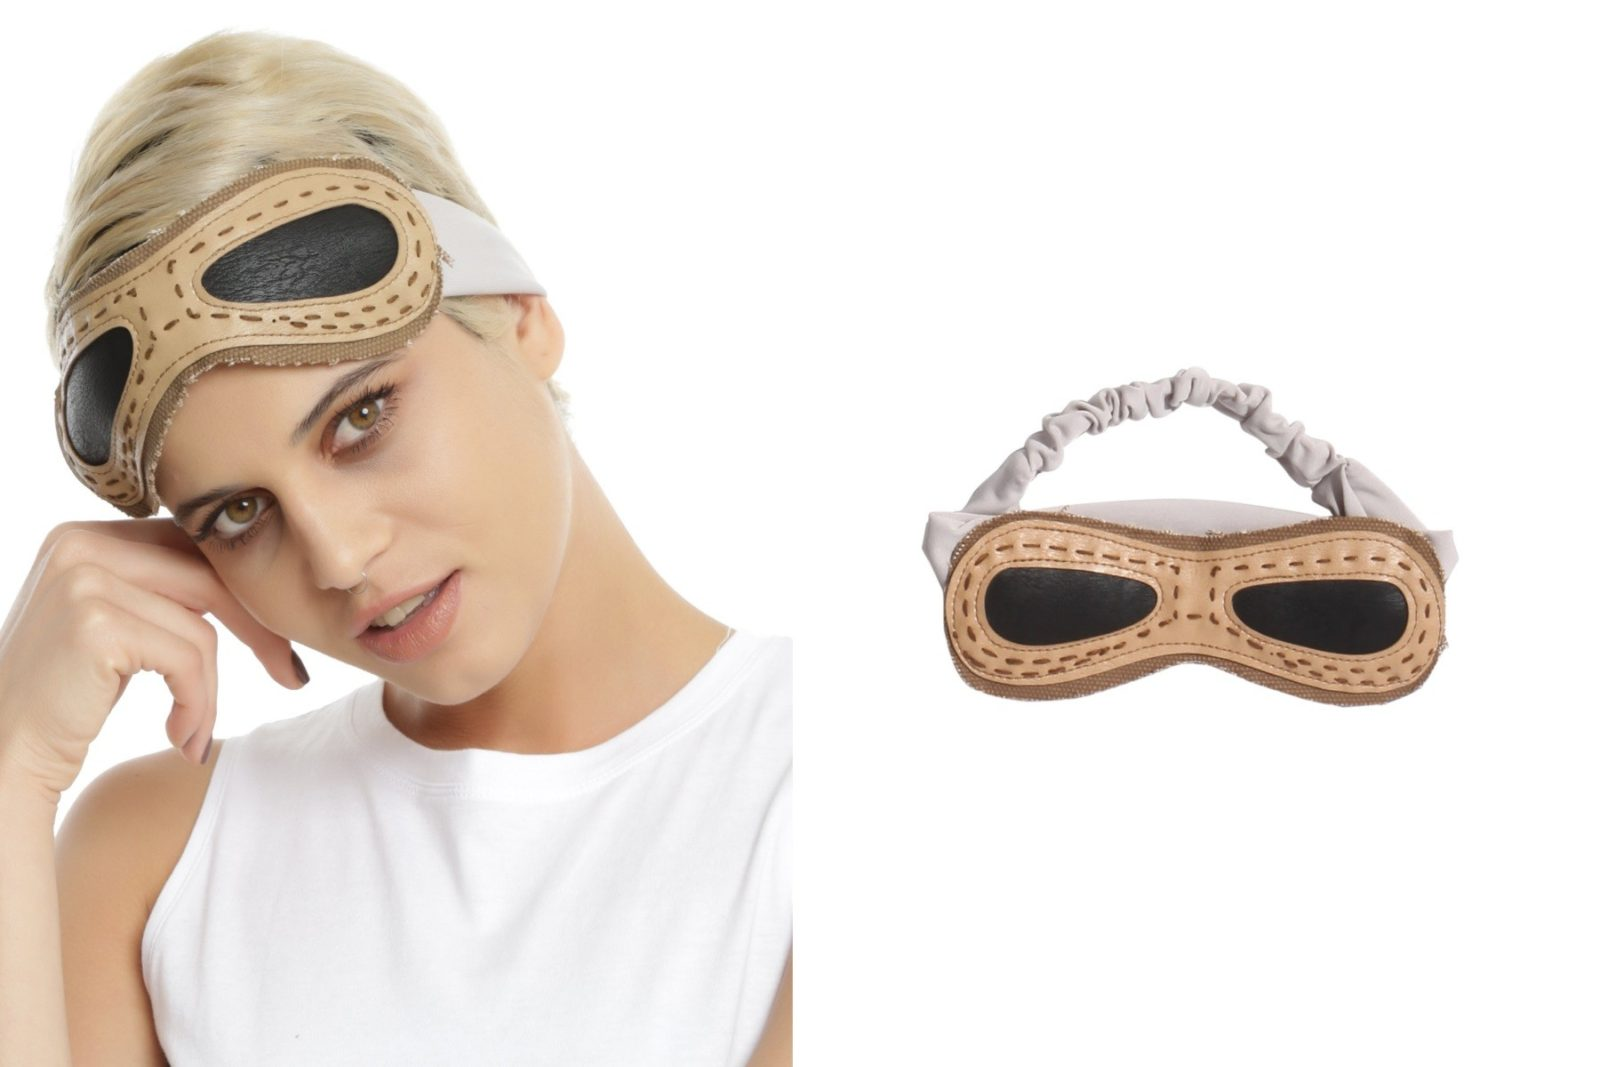 Rey goggles headband at Hot Topic